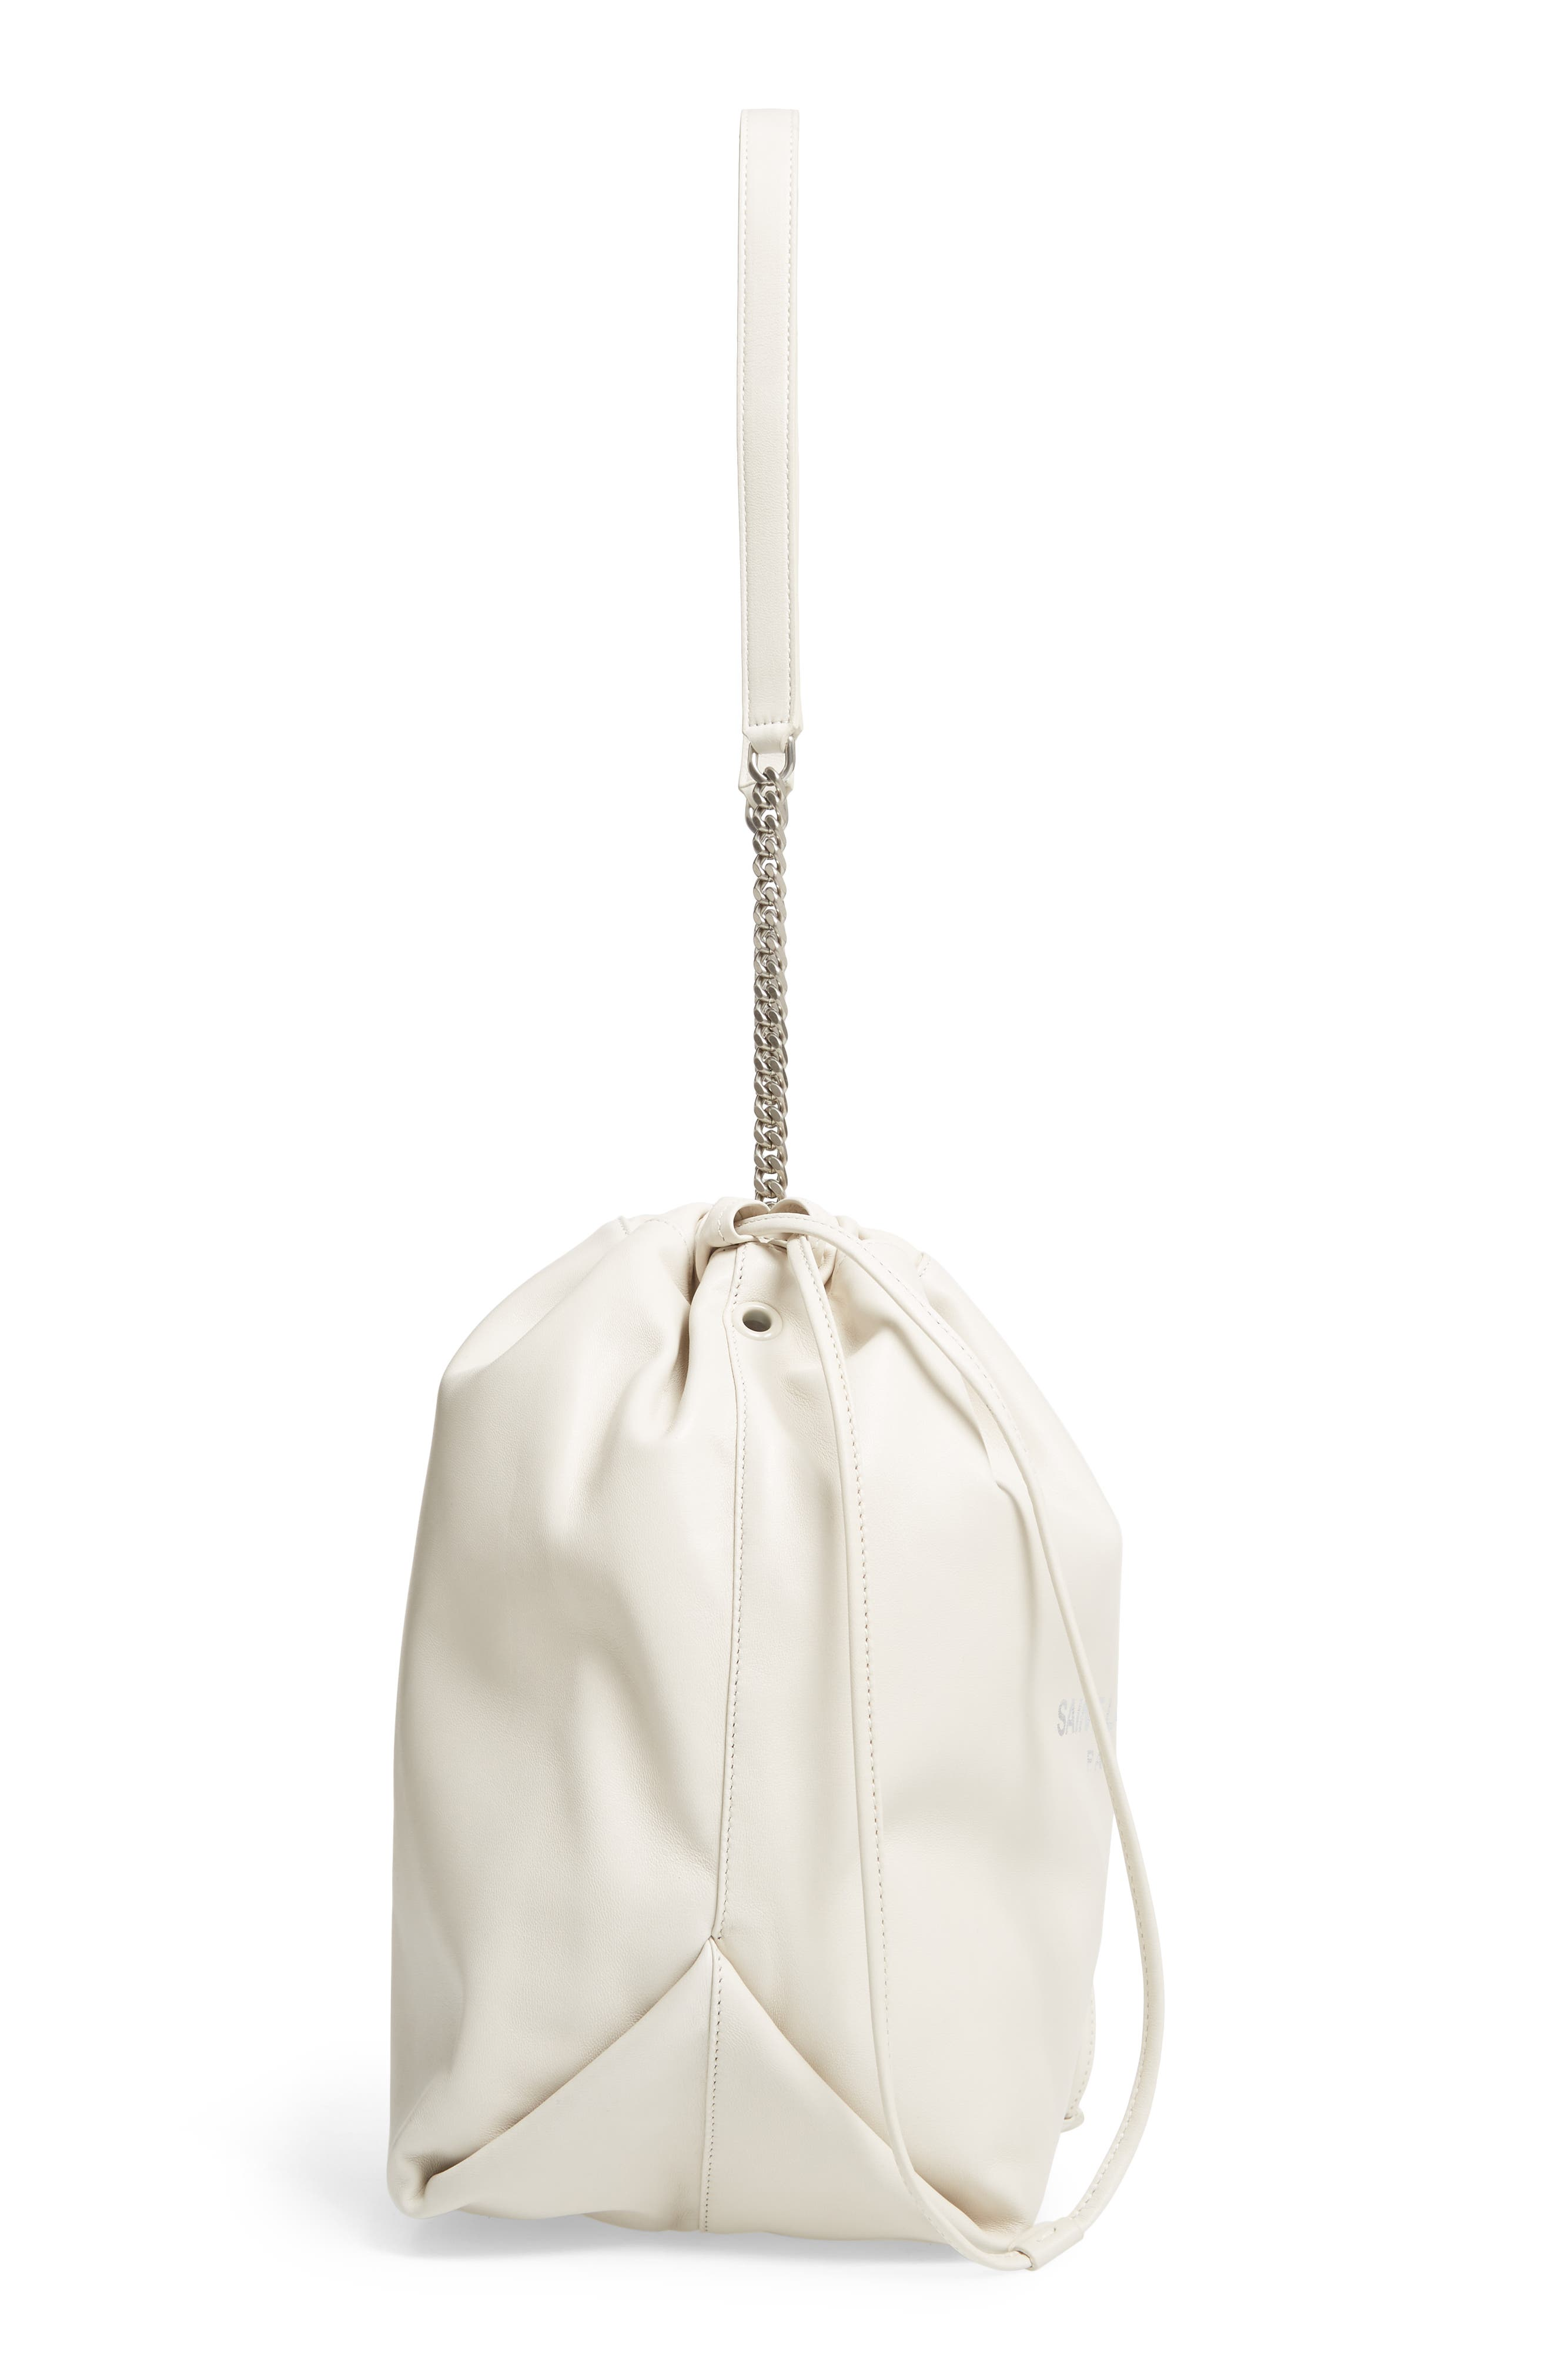 SAINT LAURENT,                             Teddy Leather Bucket Bag,                             Alternate thumbnail 5, color,                             CREMASOFT